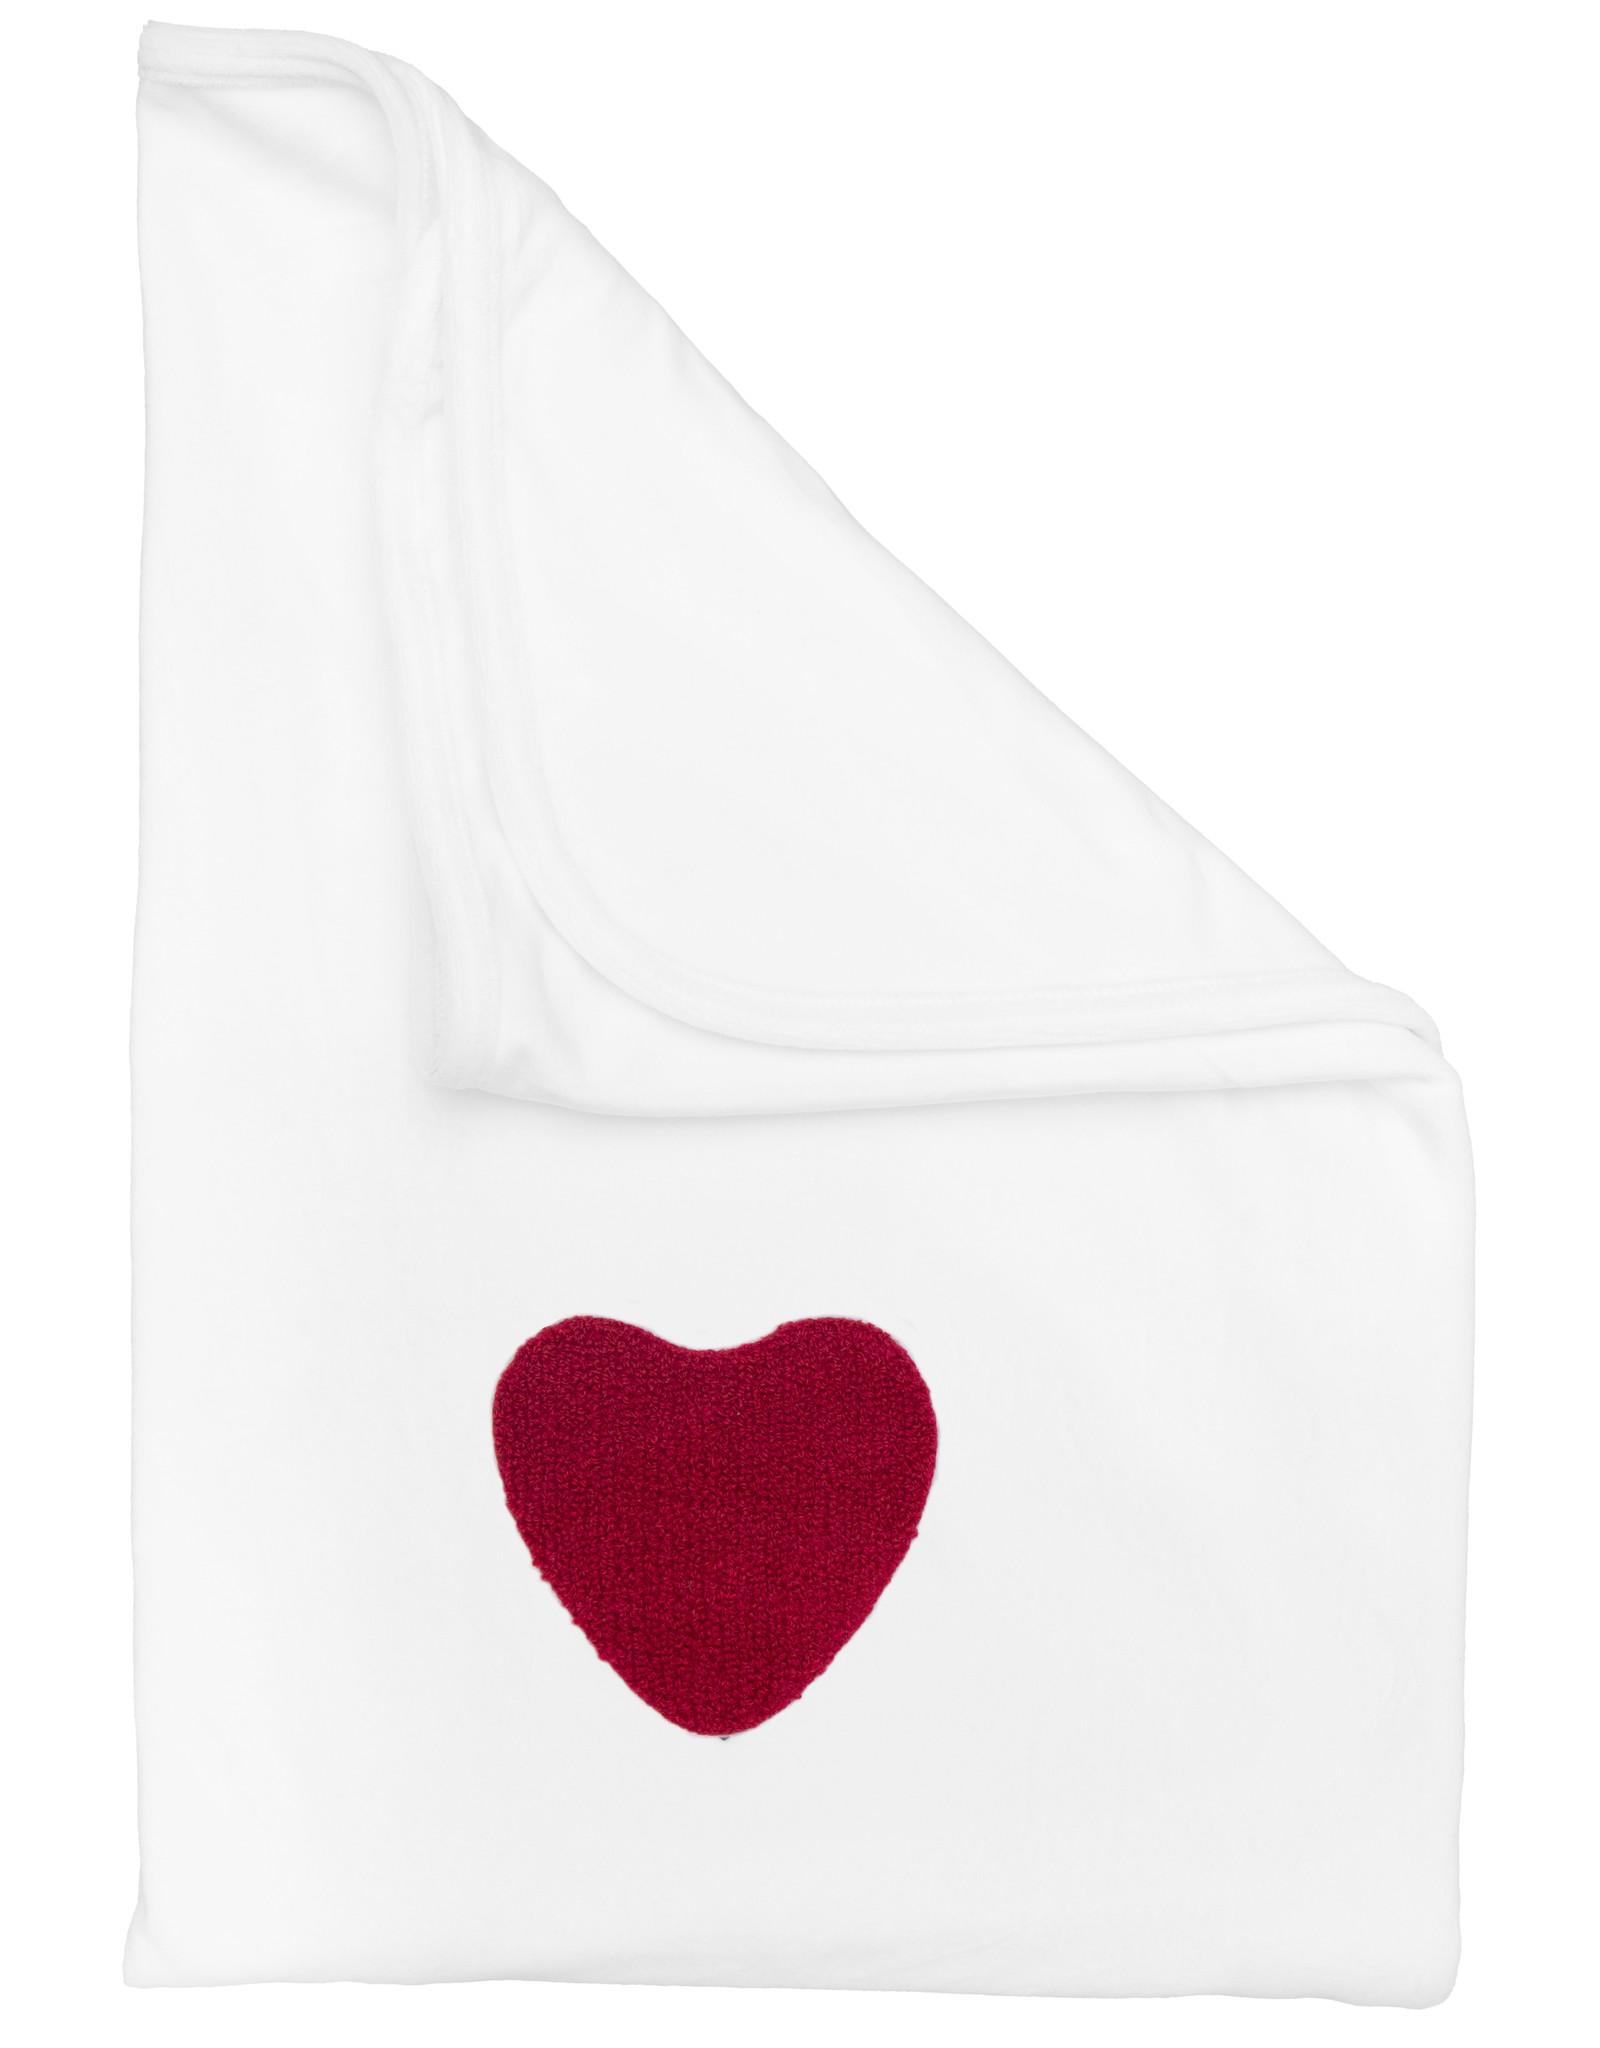 Noggi Noggi Tipped Heart/Star Blanket